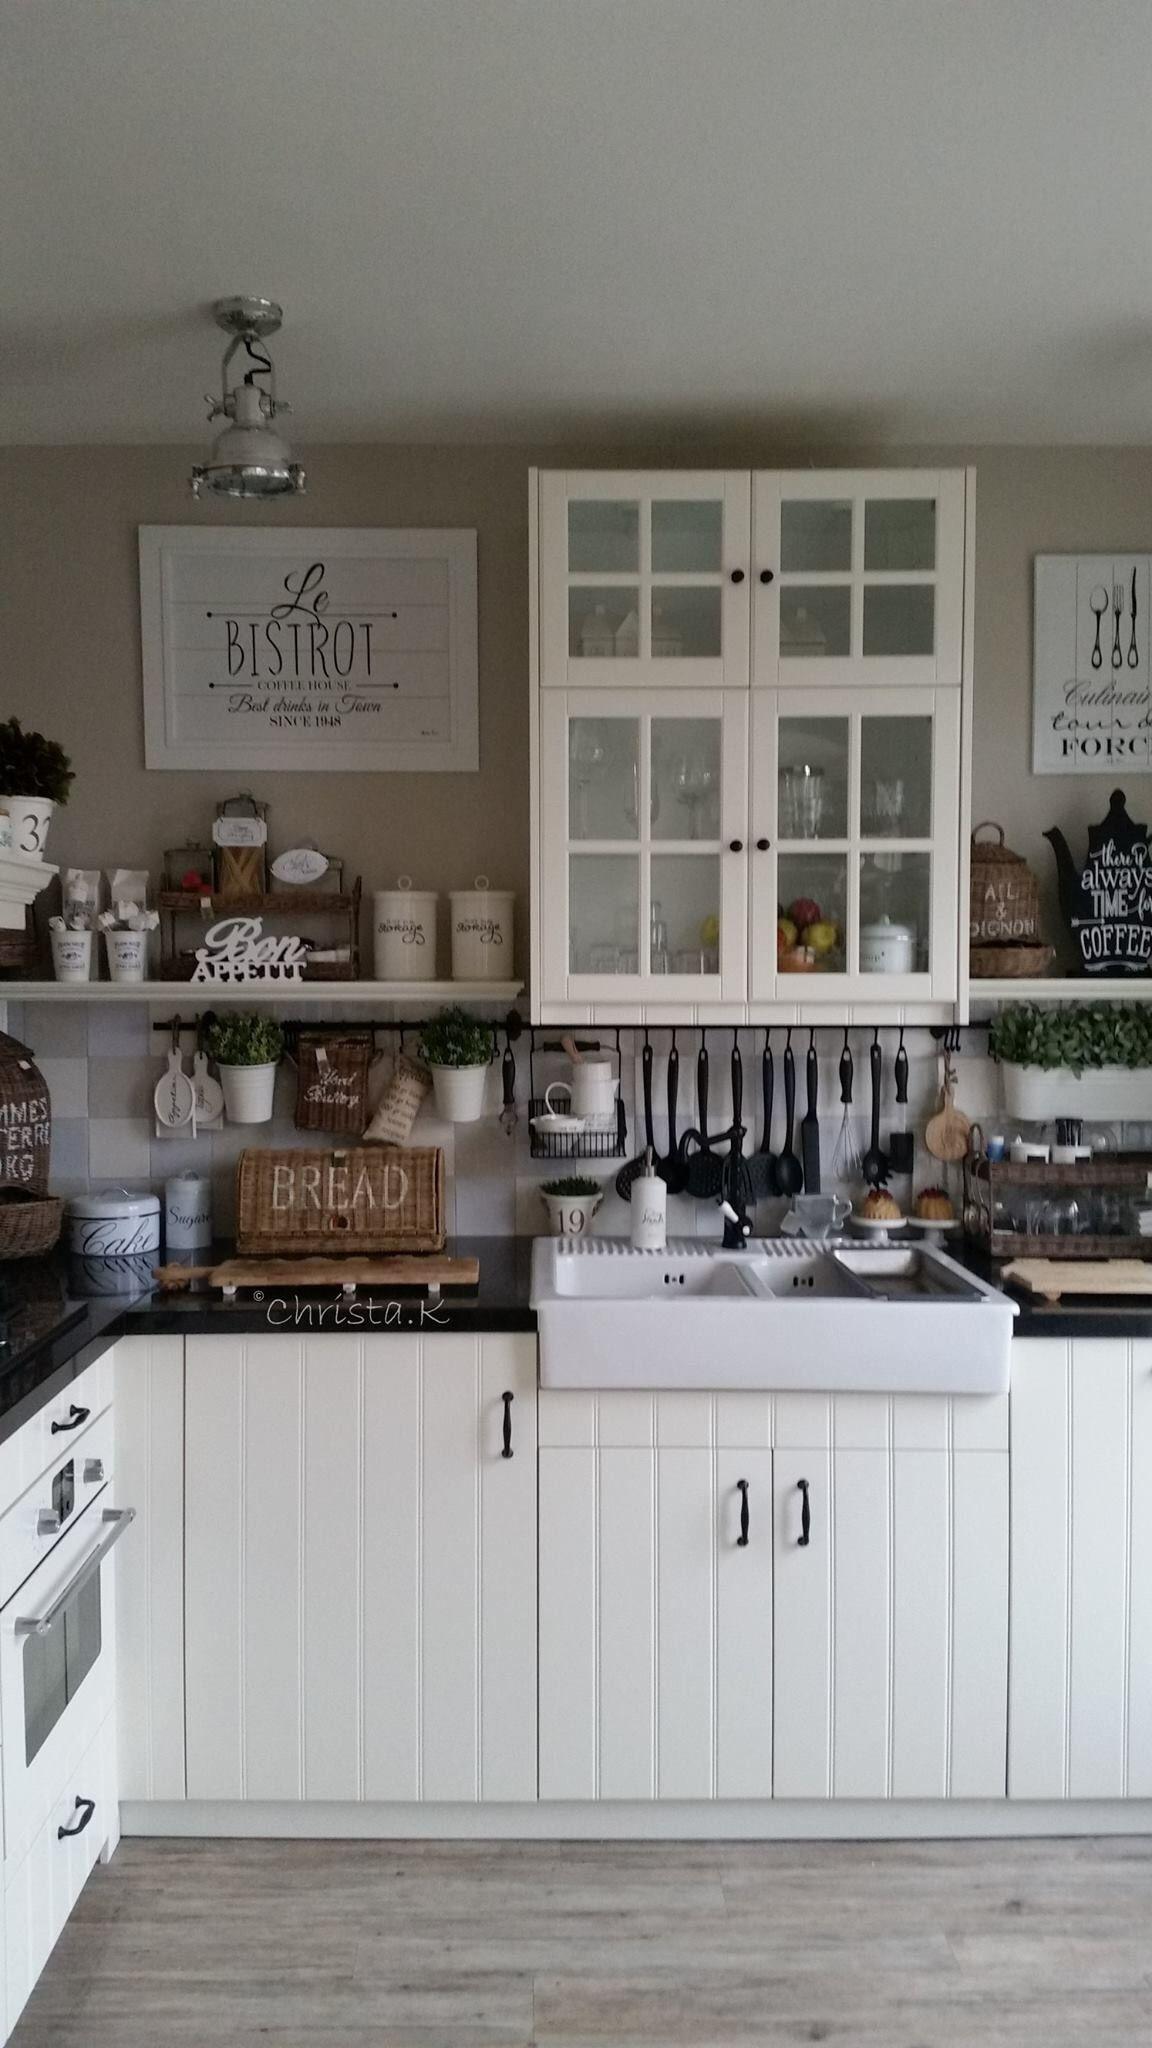 Riviera Maison keuken | My home | Pinterest | Kitchens, Shabby and House